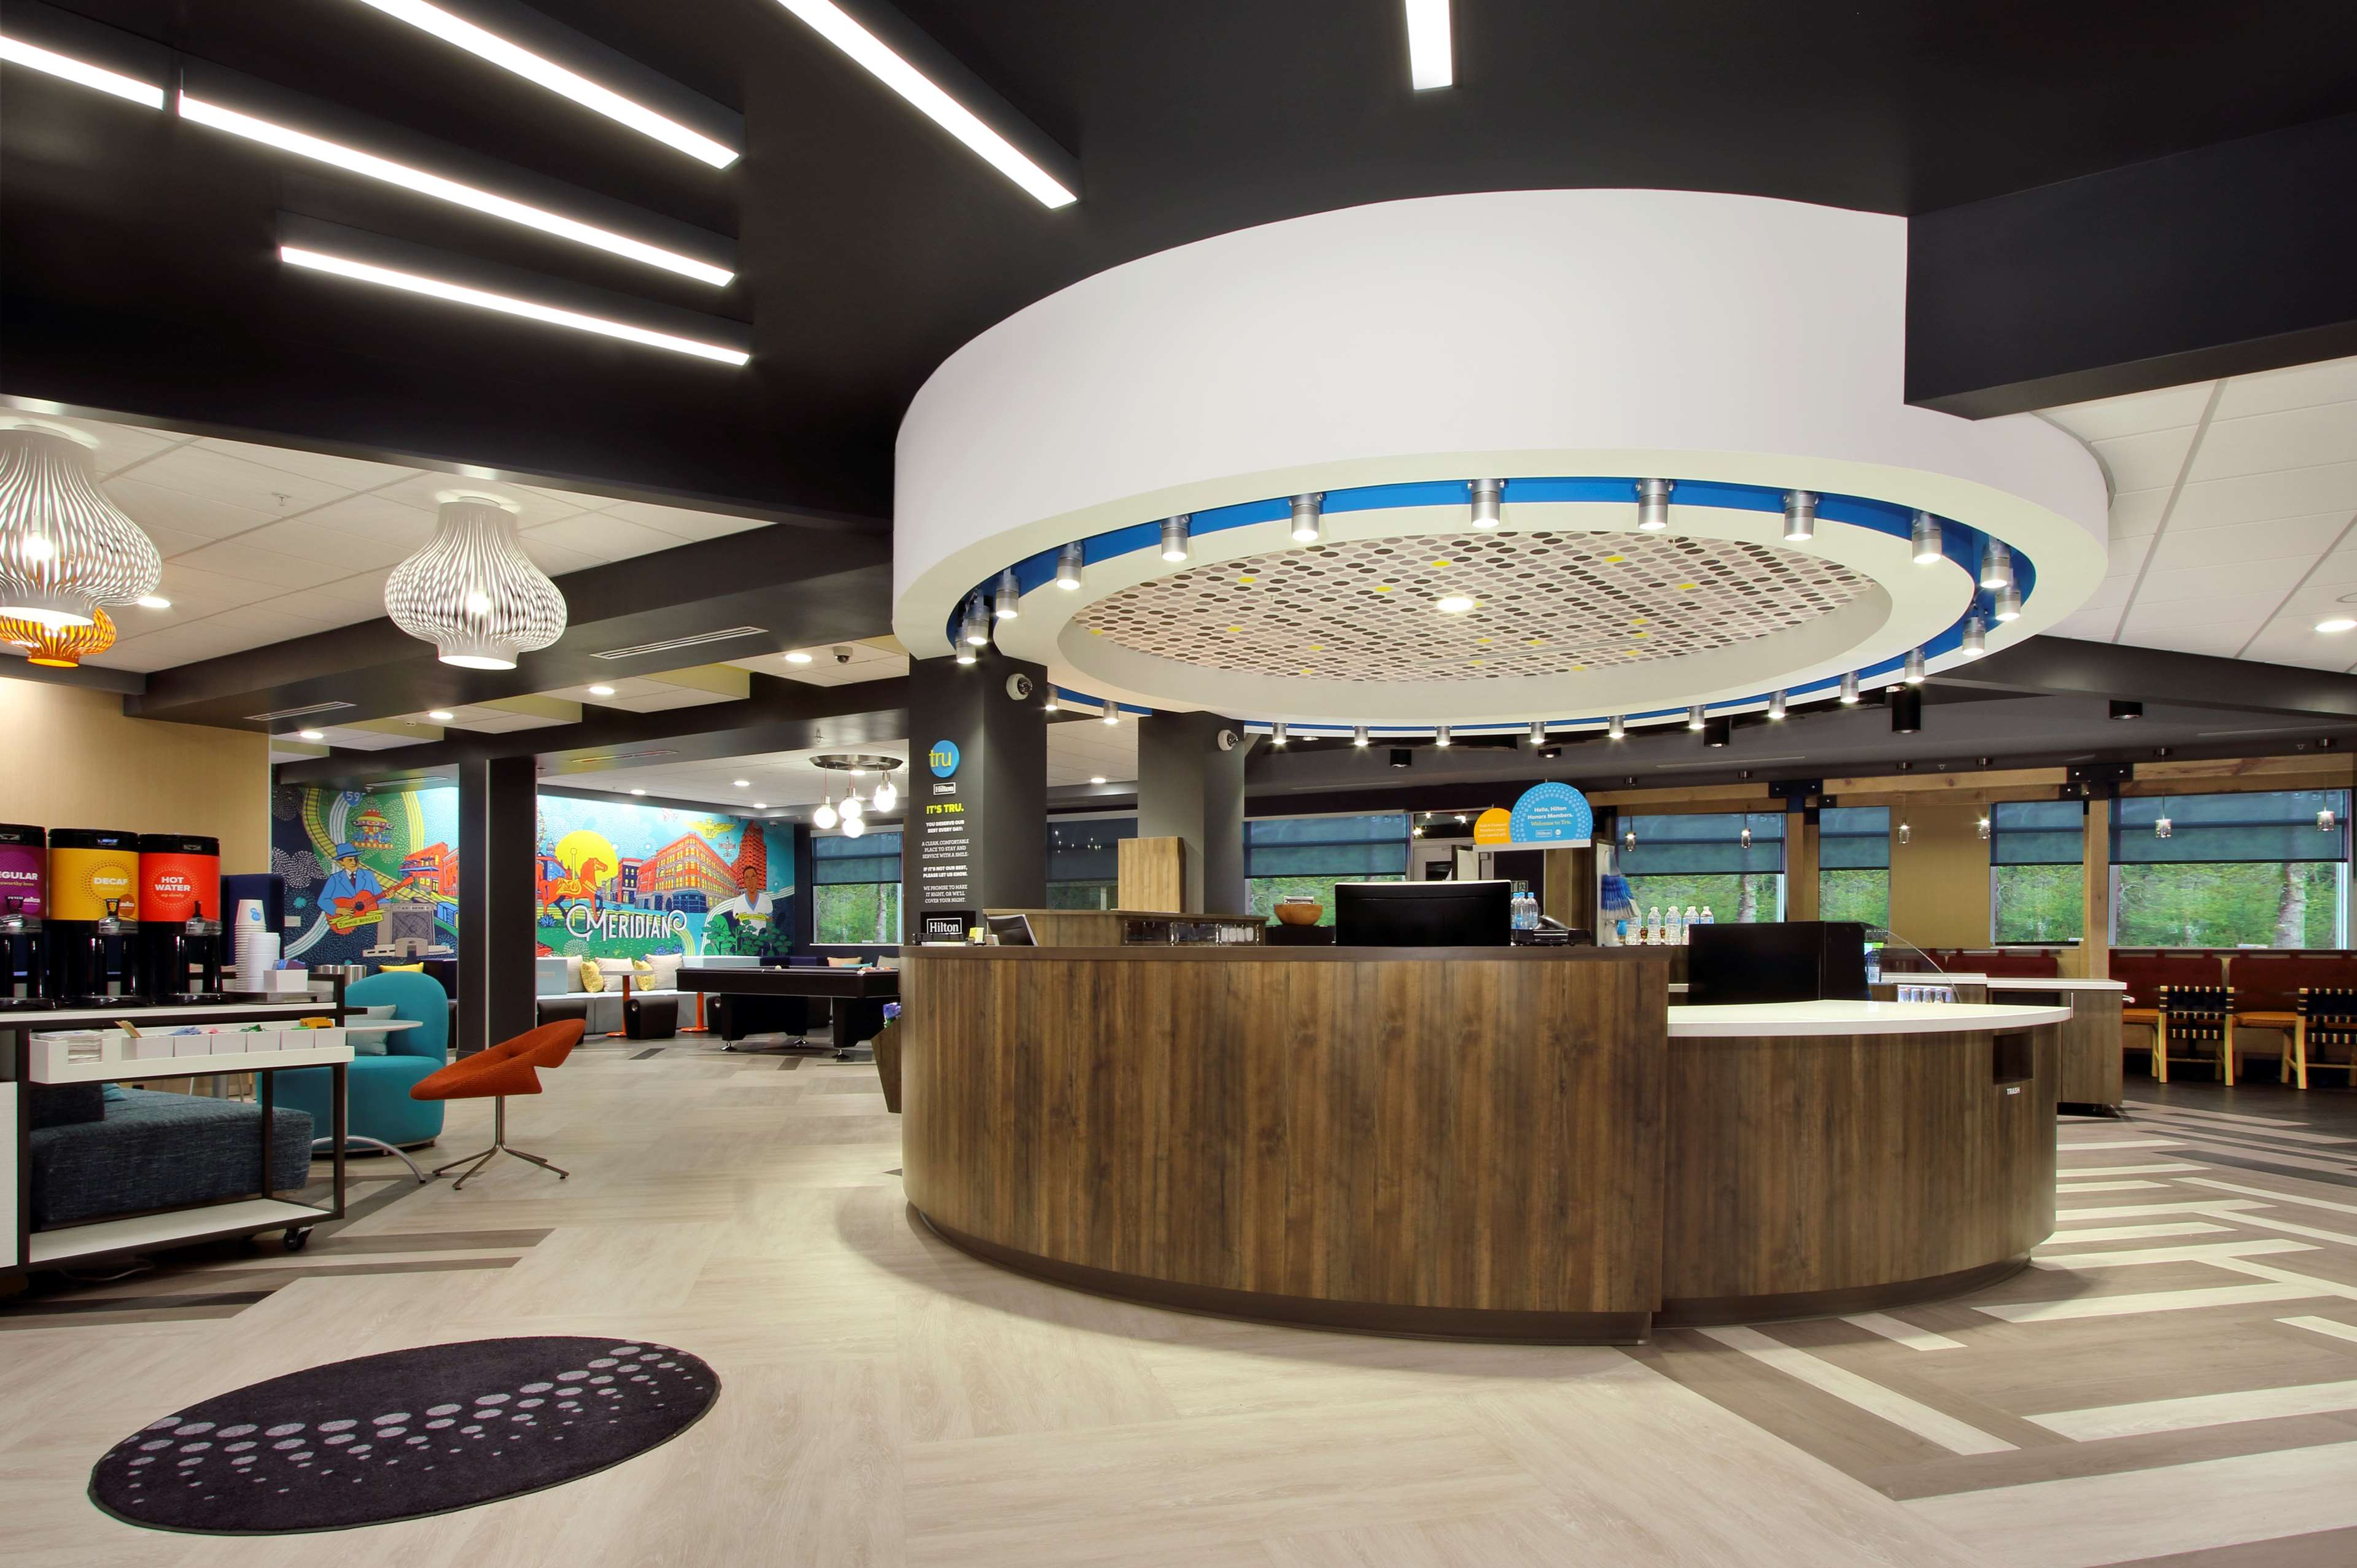 Tru by Hilton Meridian image 4